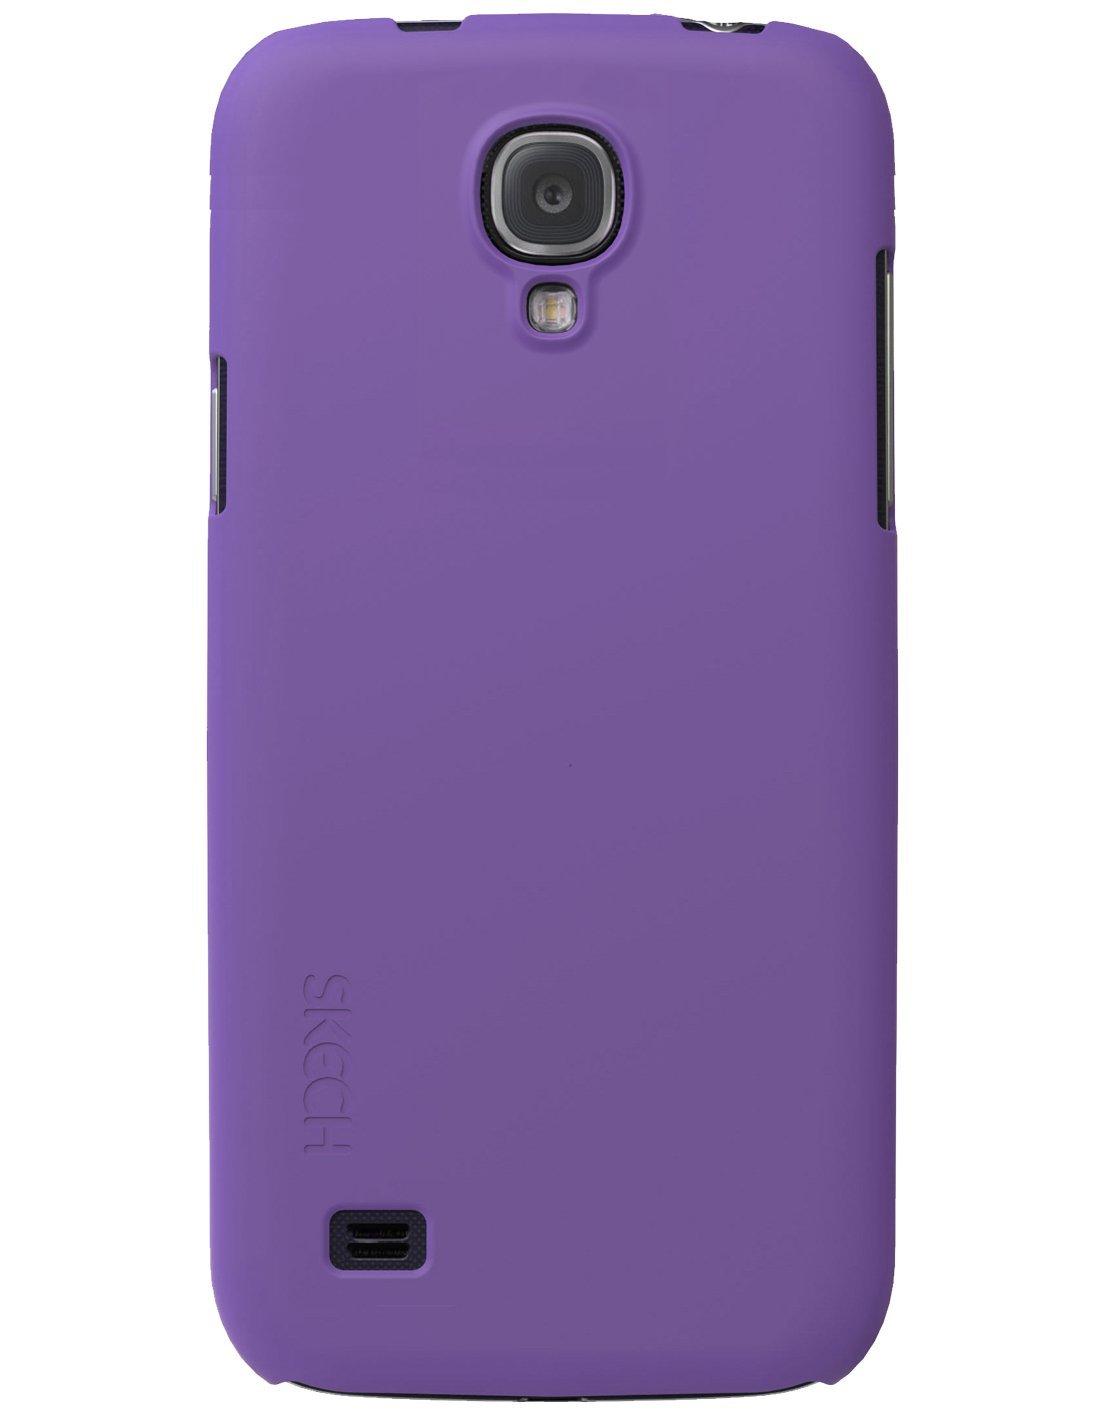 Skech Slim Case for Samsung S4 Mini - Purple